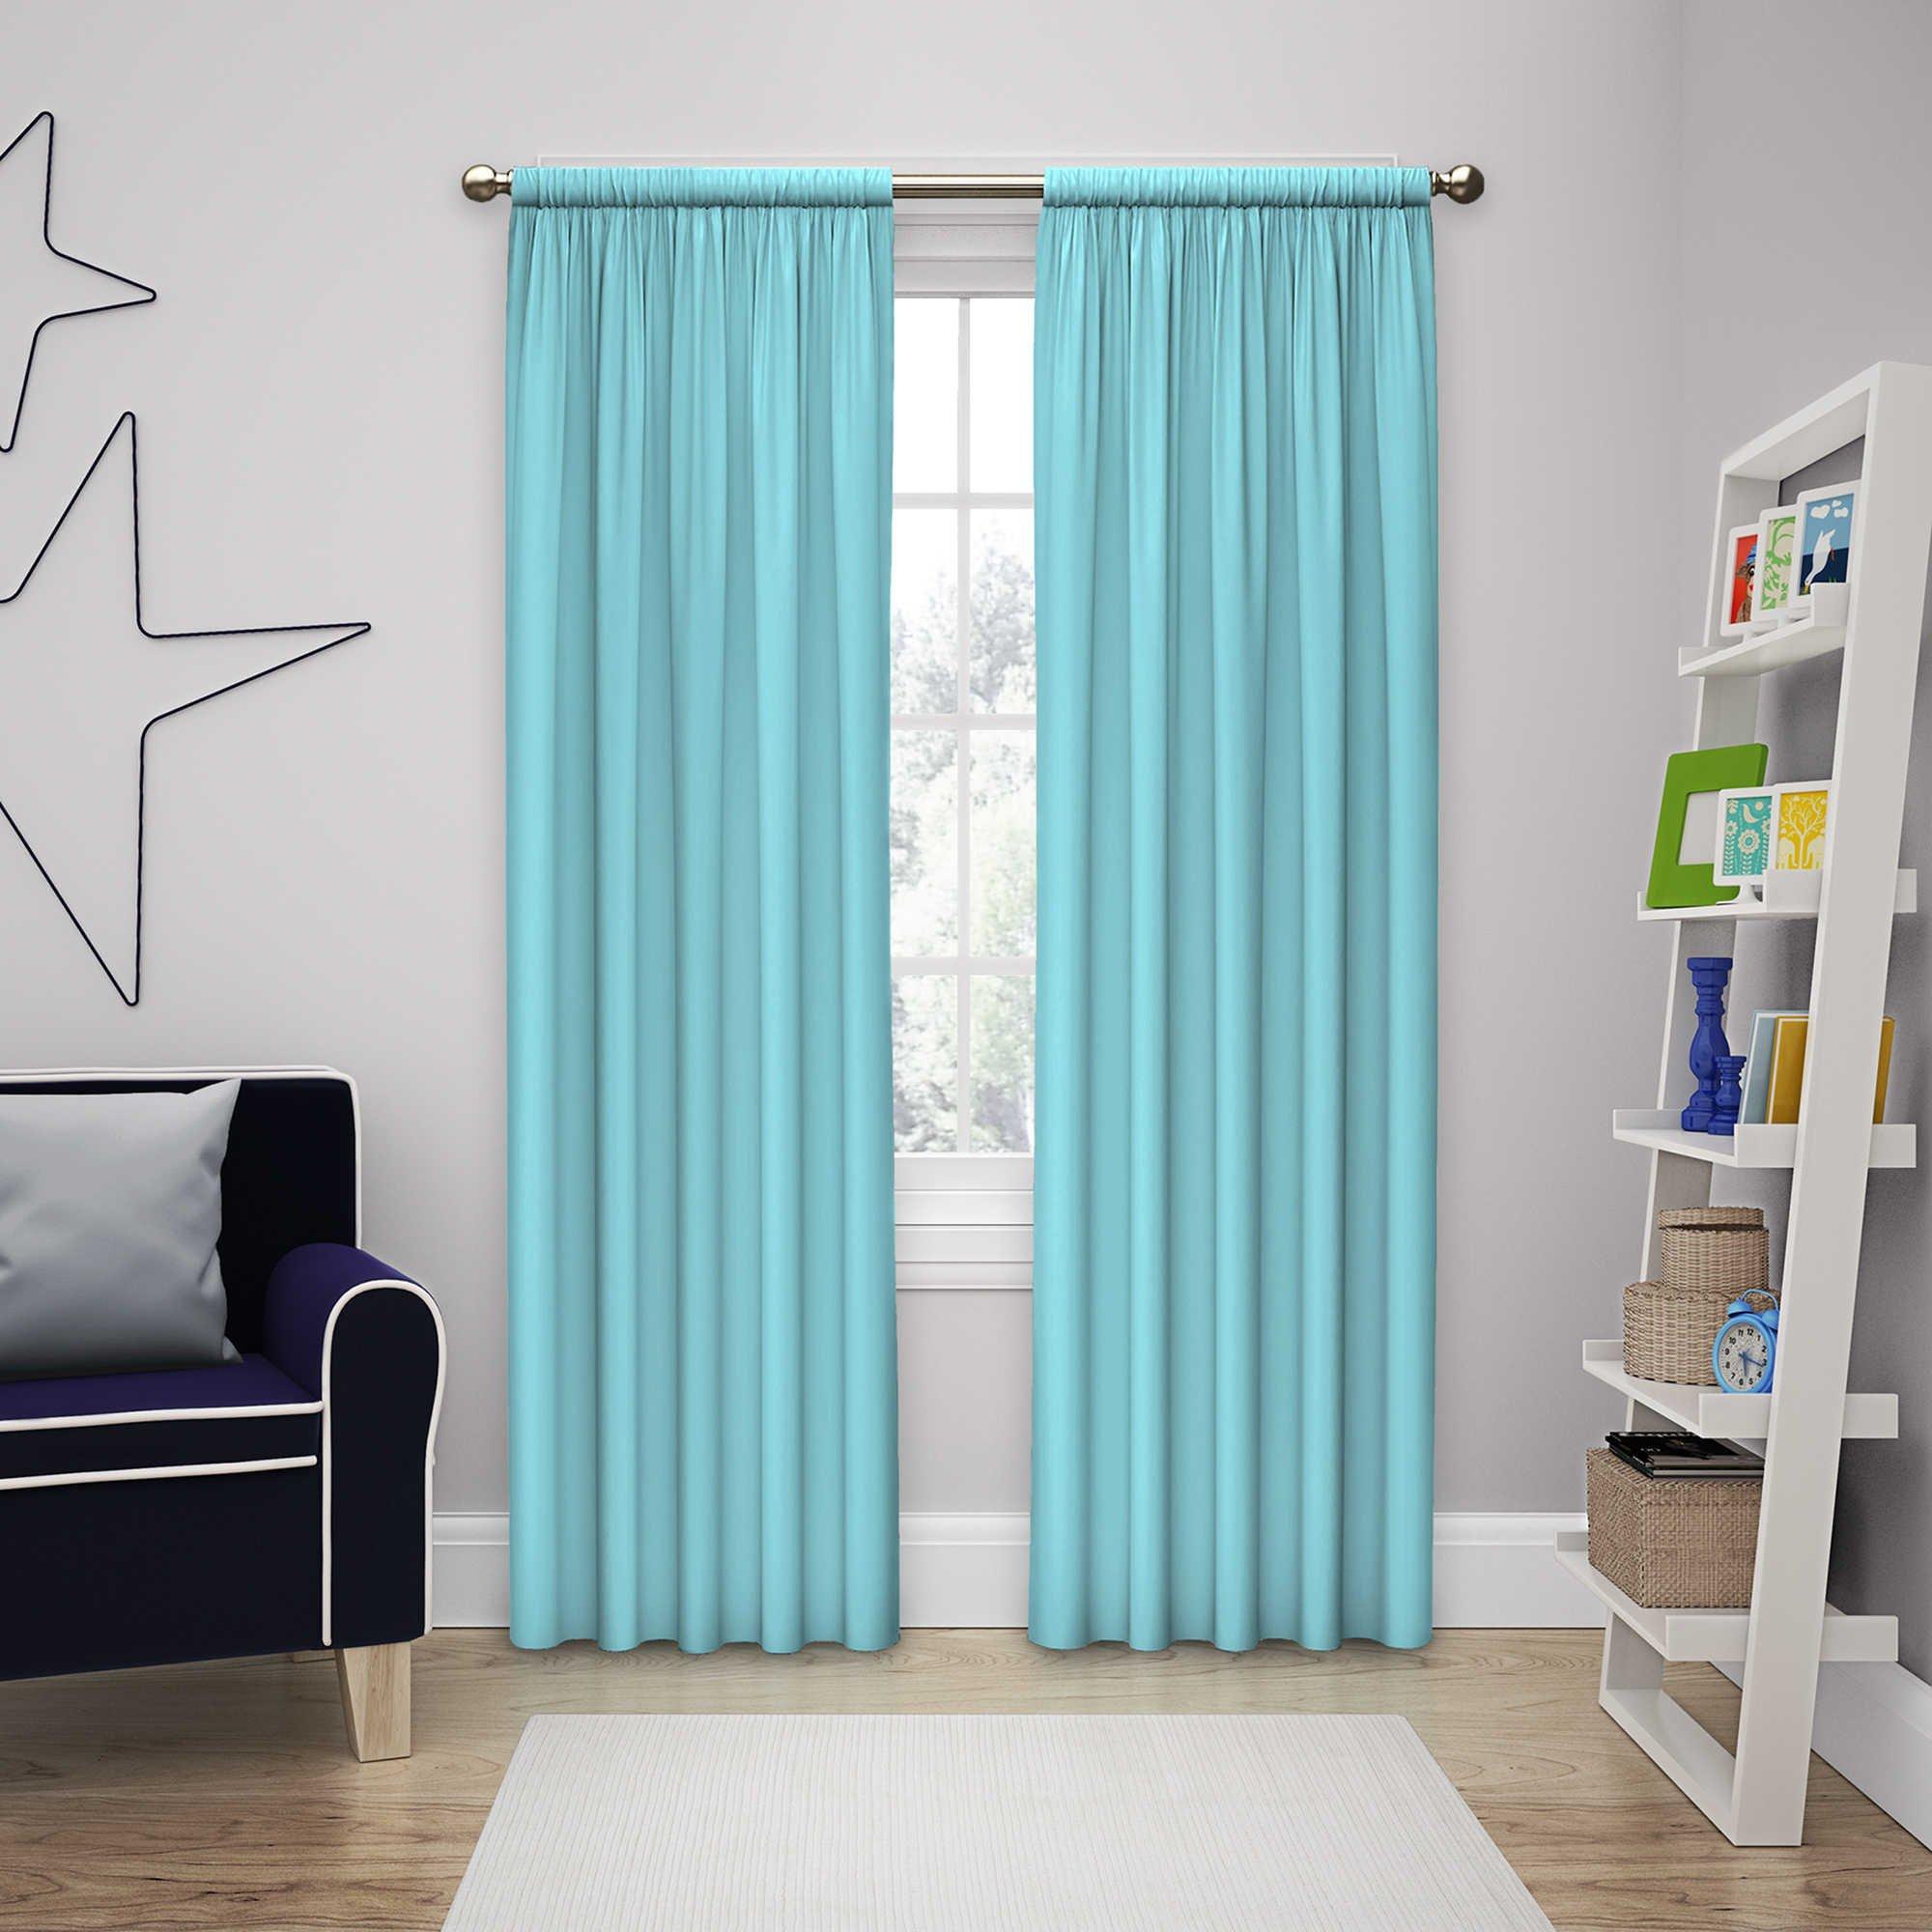 Solar Shield Microfiber Rod Pocket Light Filtering Window Curtain Panel (63-Inch, POOL)